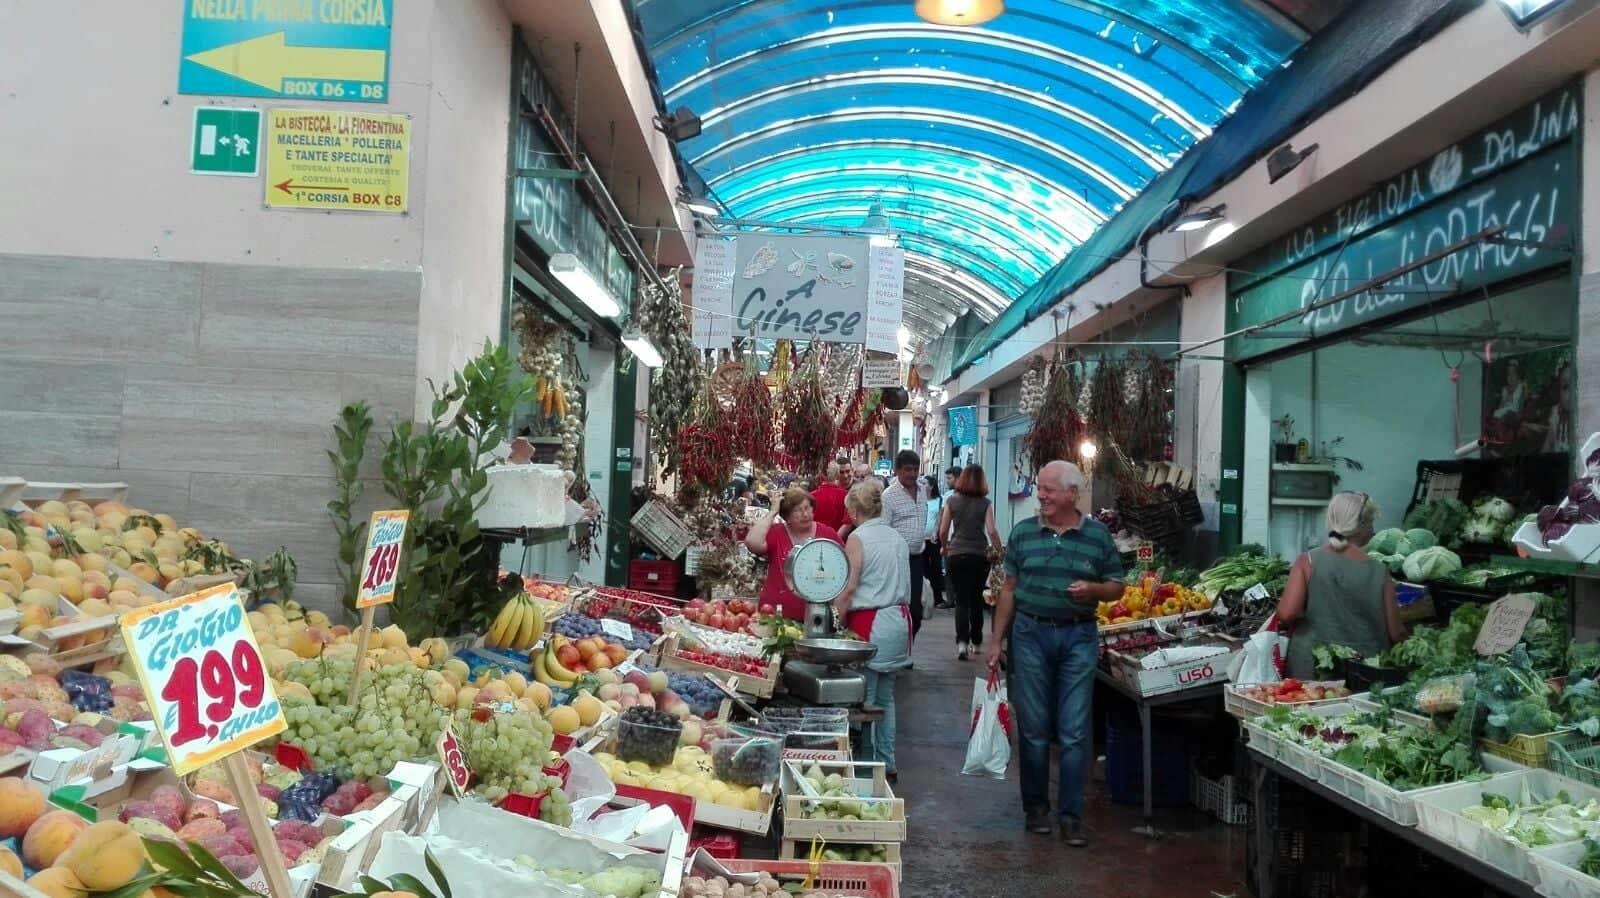 Covid, riapertura parziale dei mercati in Campania: l'ordinanza di De Luca